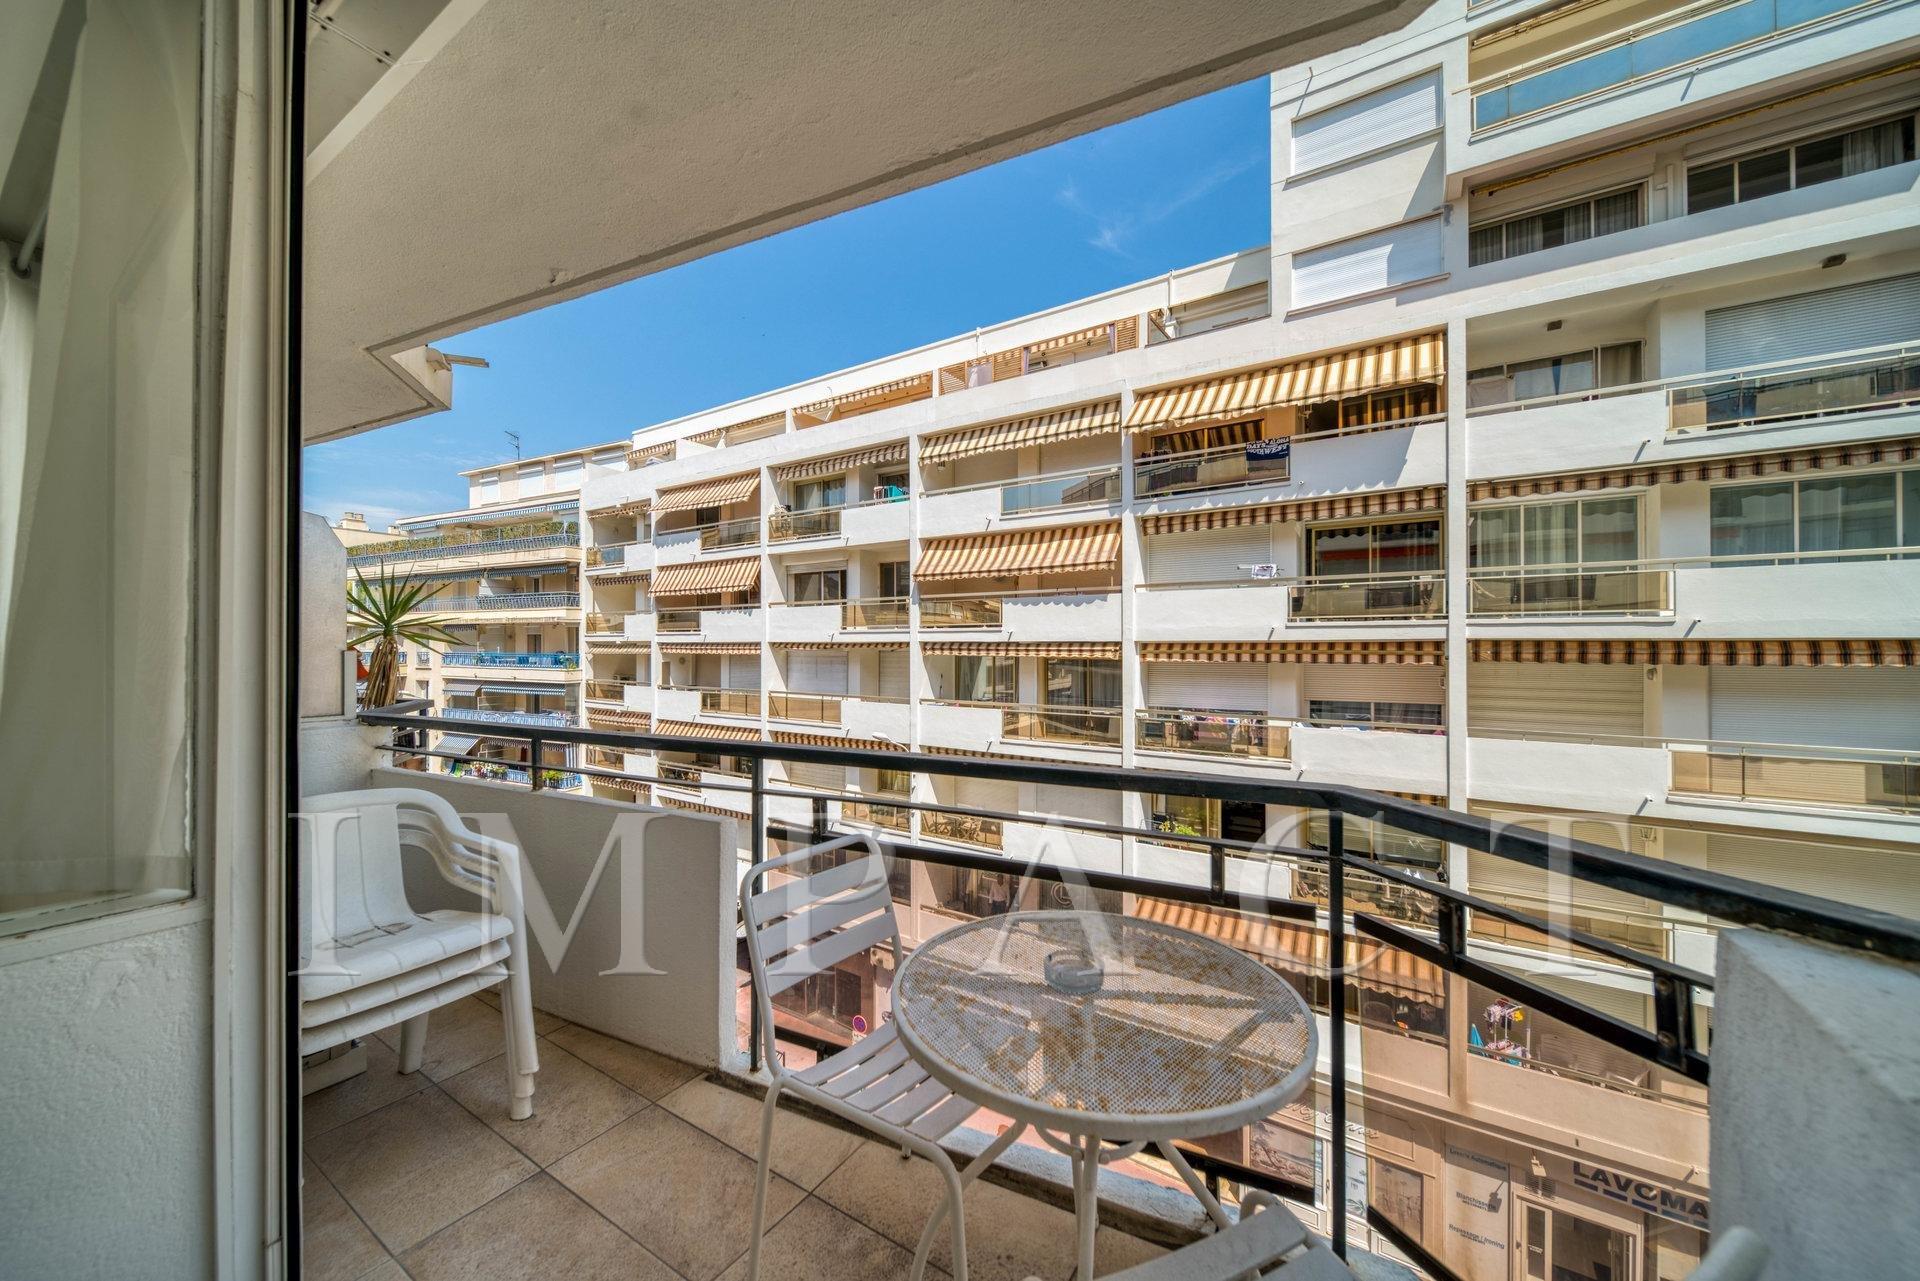 Apartement for sale in Cannes - Arrière Croisette